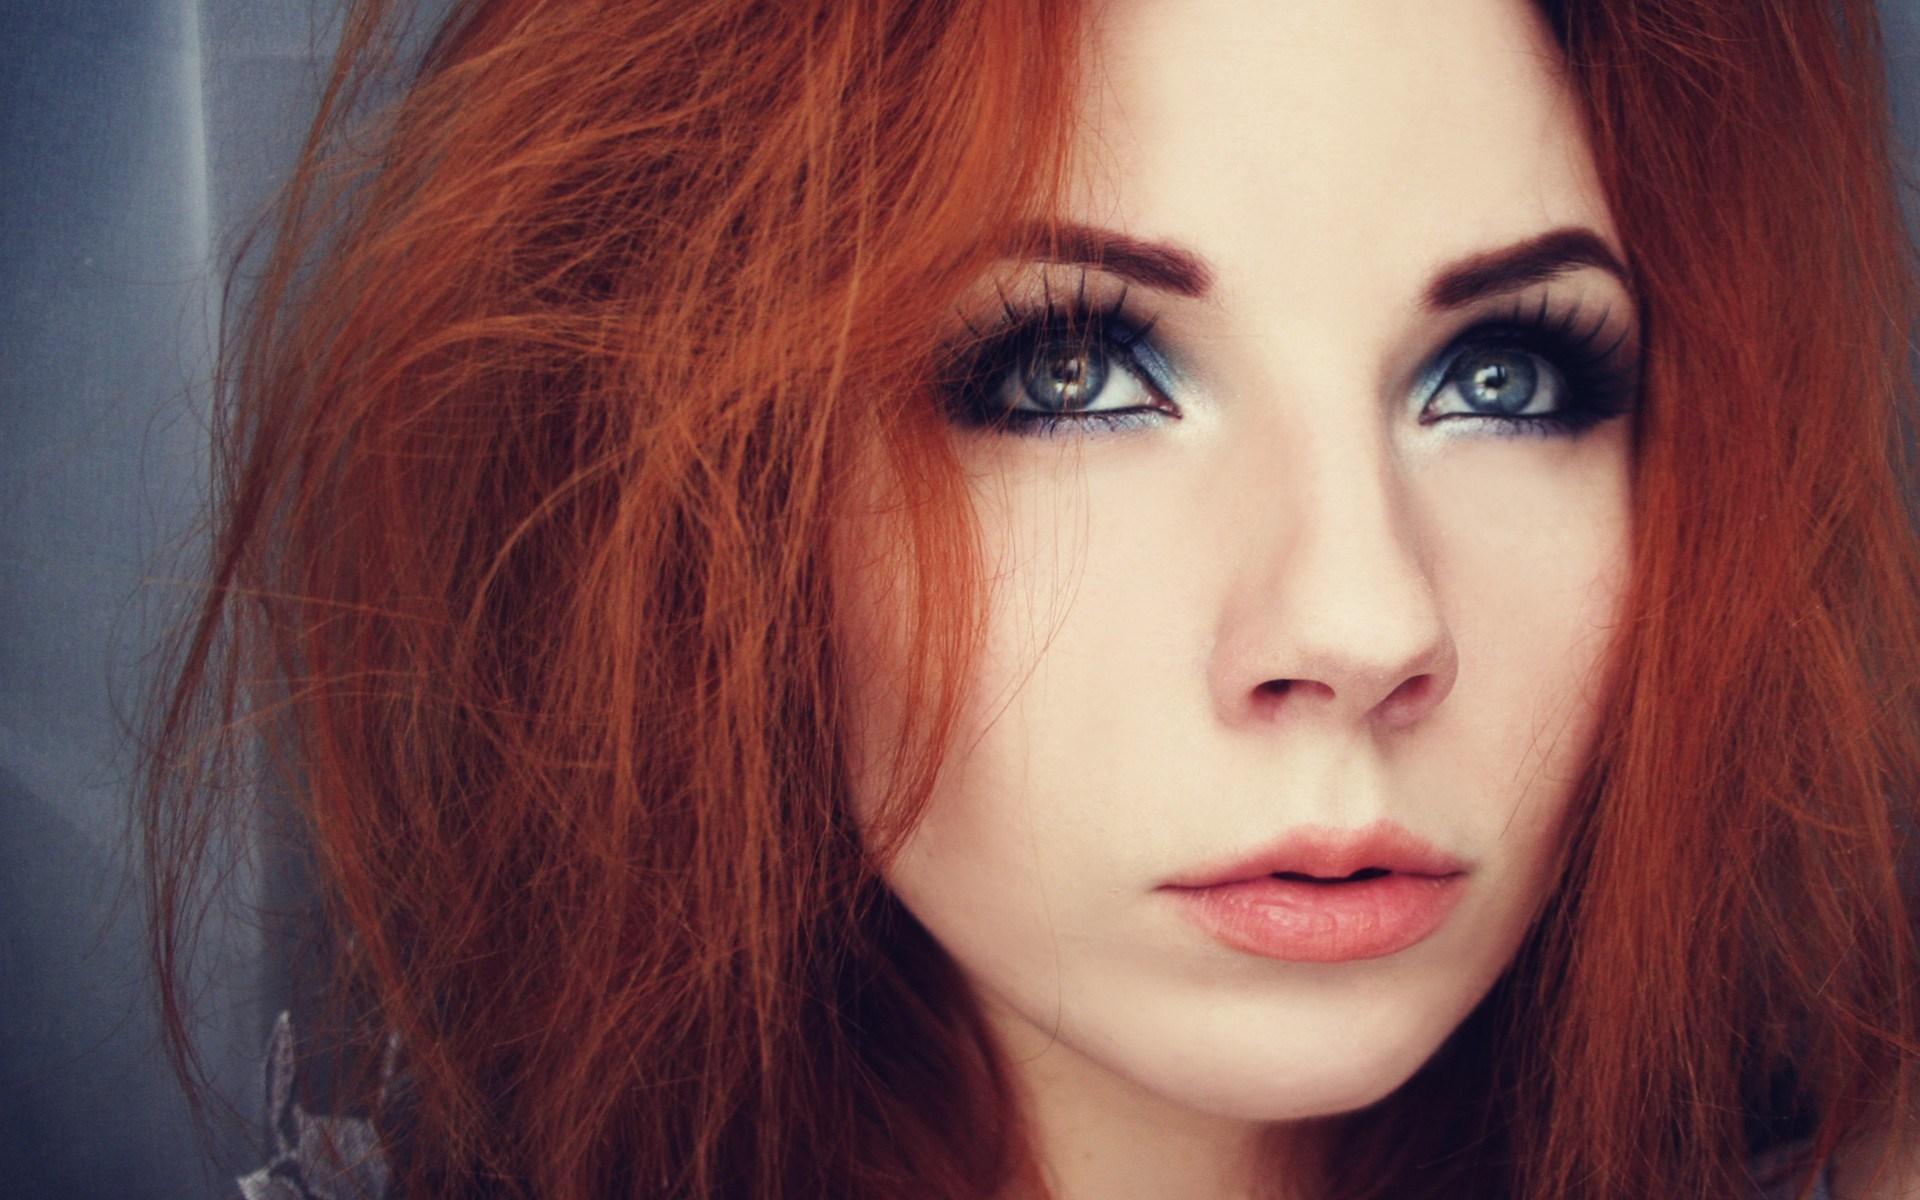 Portrait Look Redhead Girl